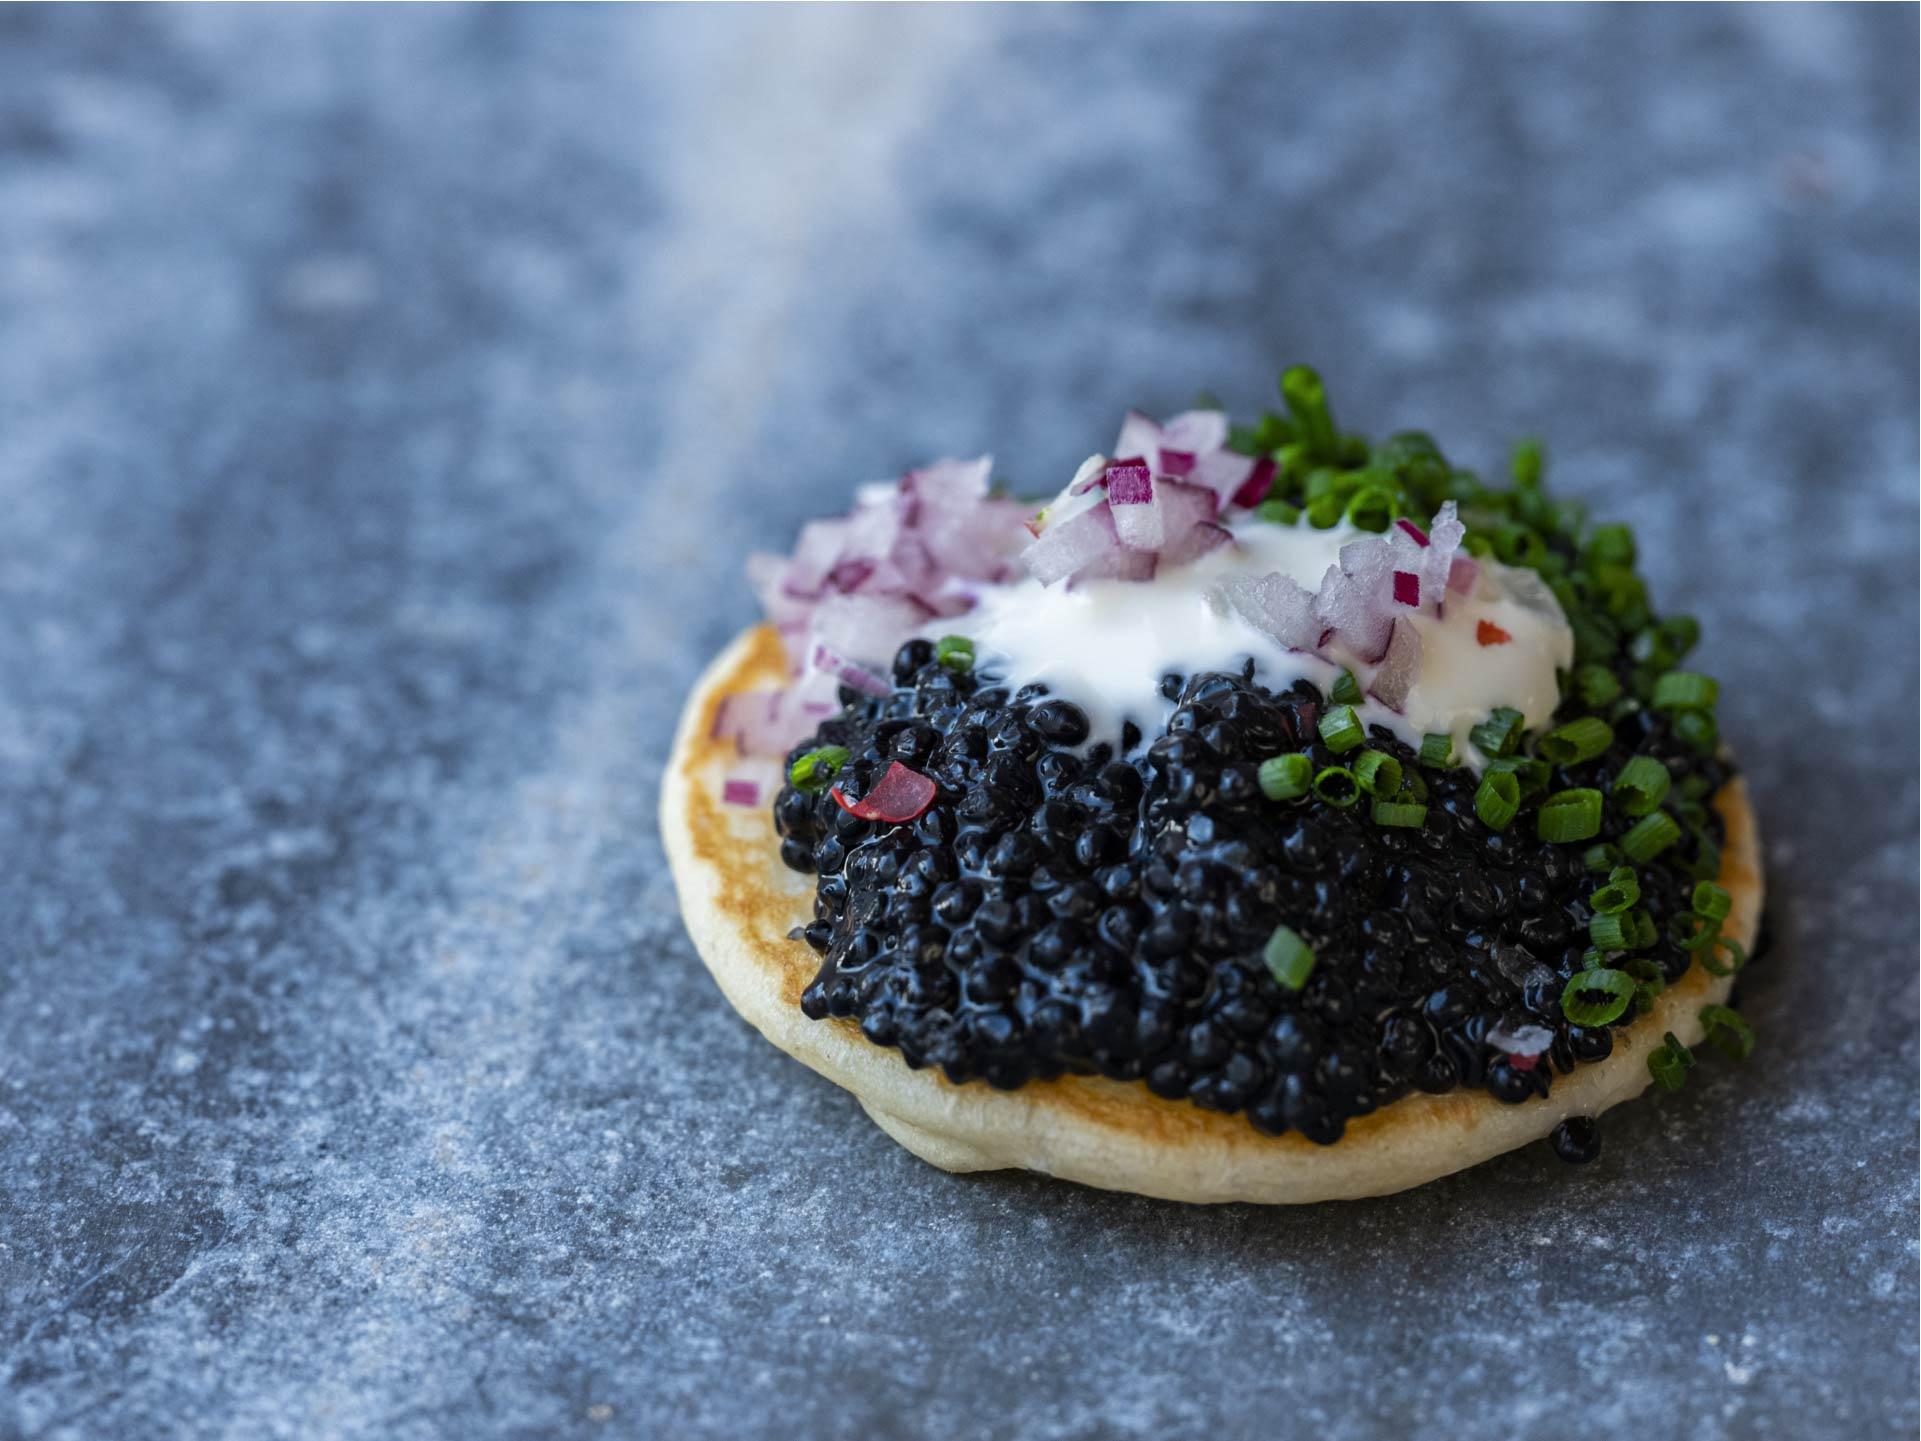 Black kelp caviar on crepe - plant based caviar